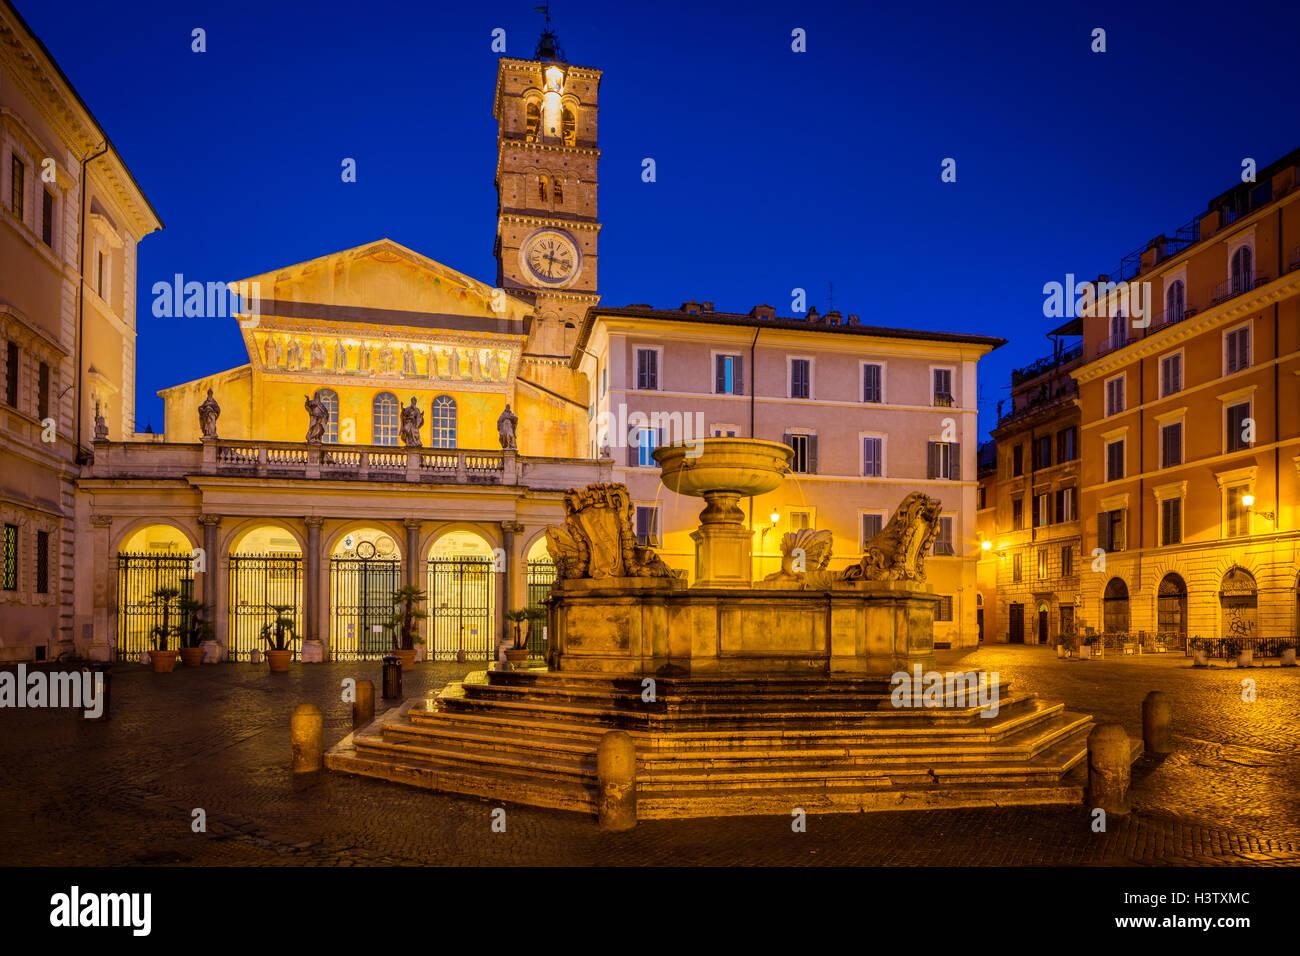 Piazza di Santa Maria and Basilica di Santa Maria in the Trastevere part of Rome, Italy - Stock Image